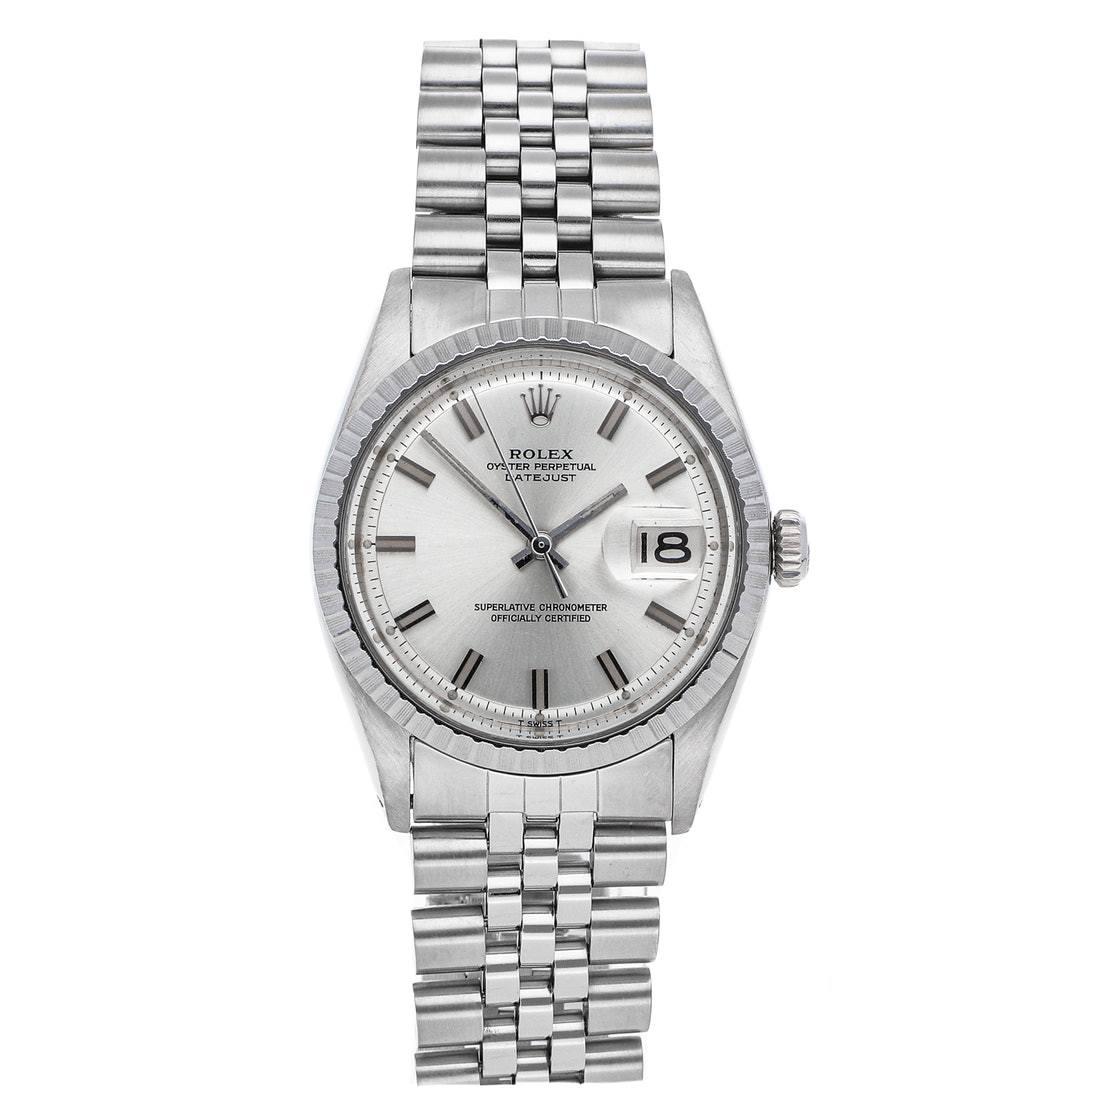 Rolex Datejust 1603 via Watchbox The Watchbox